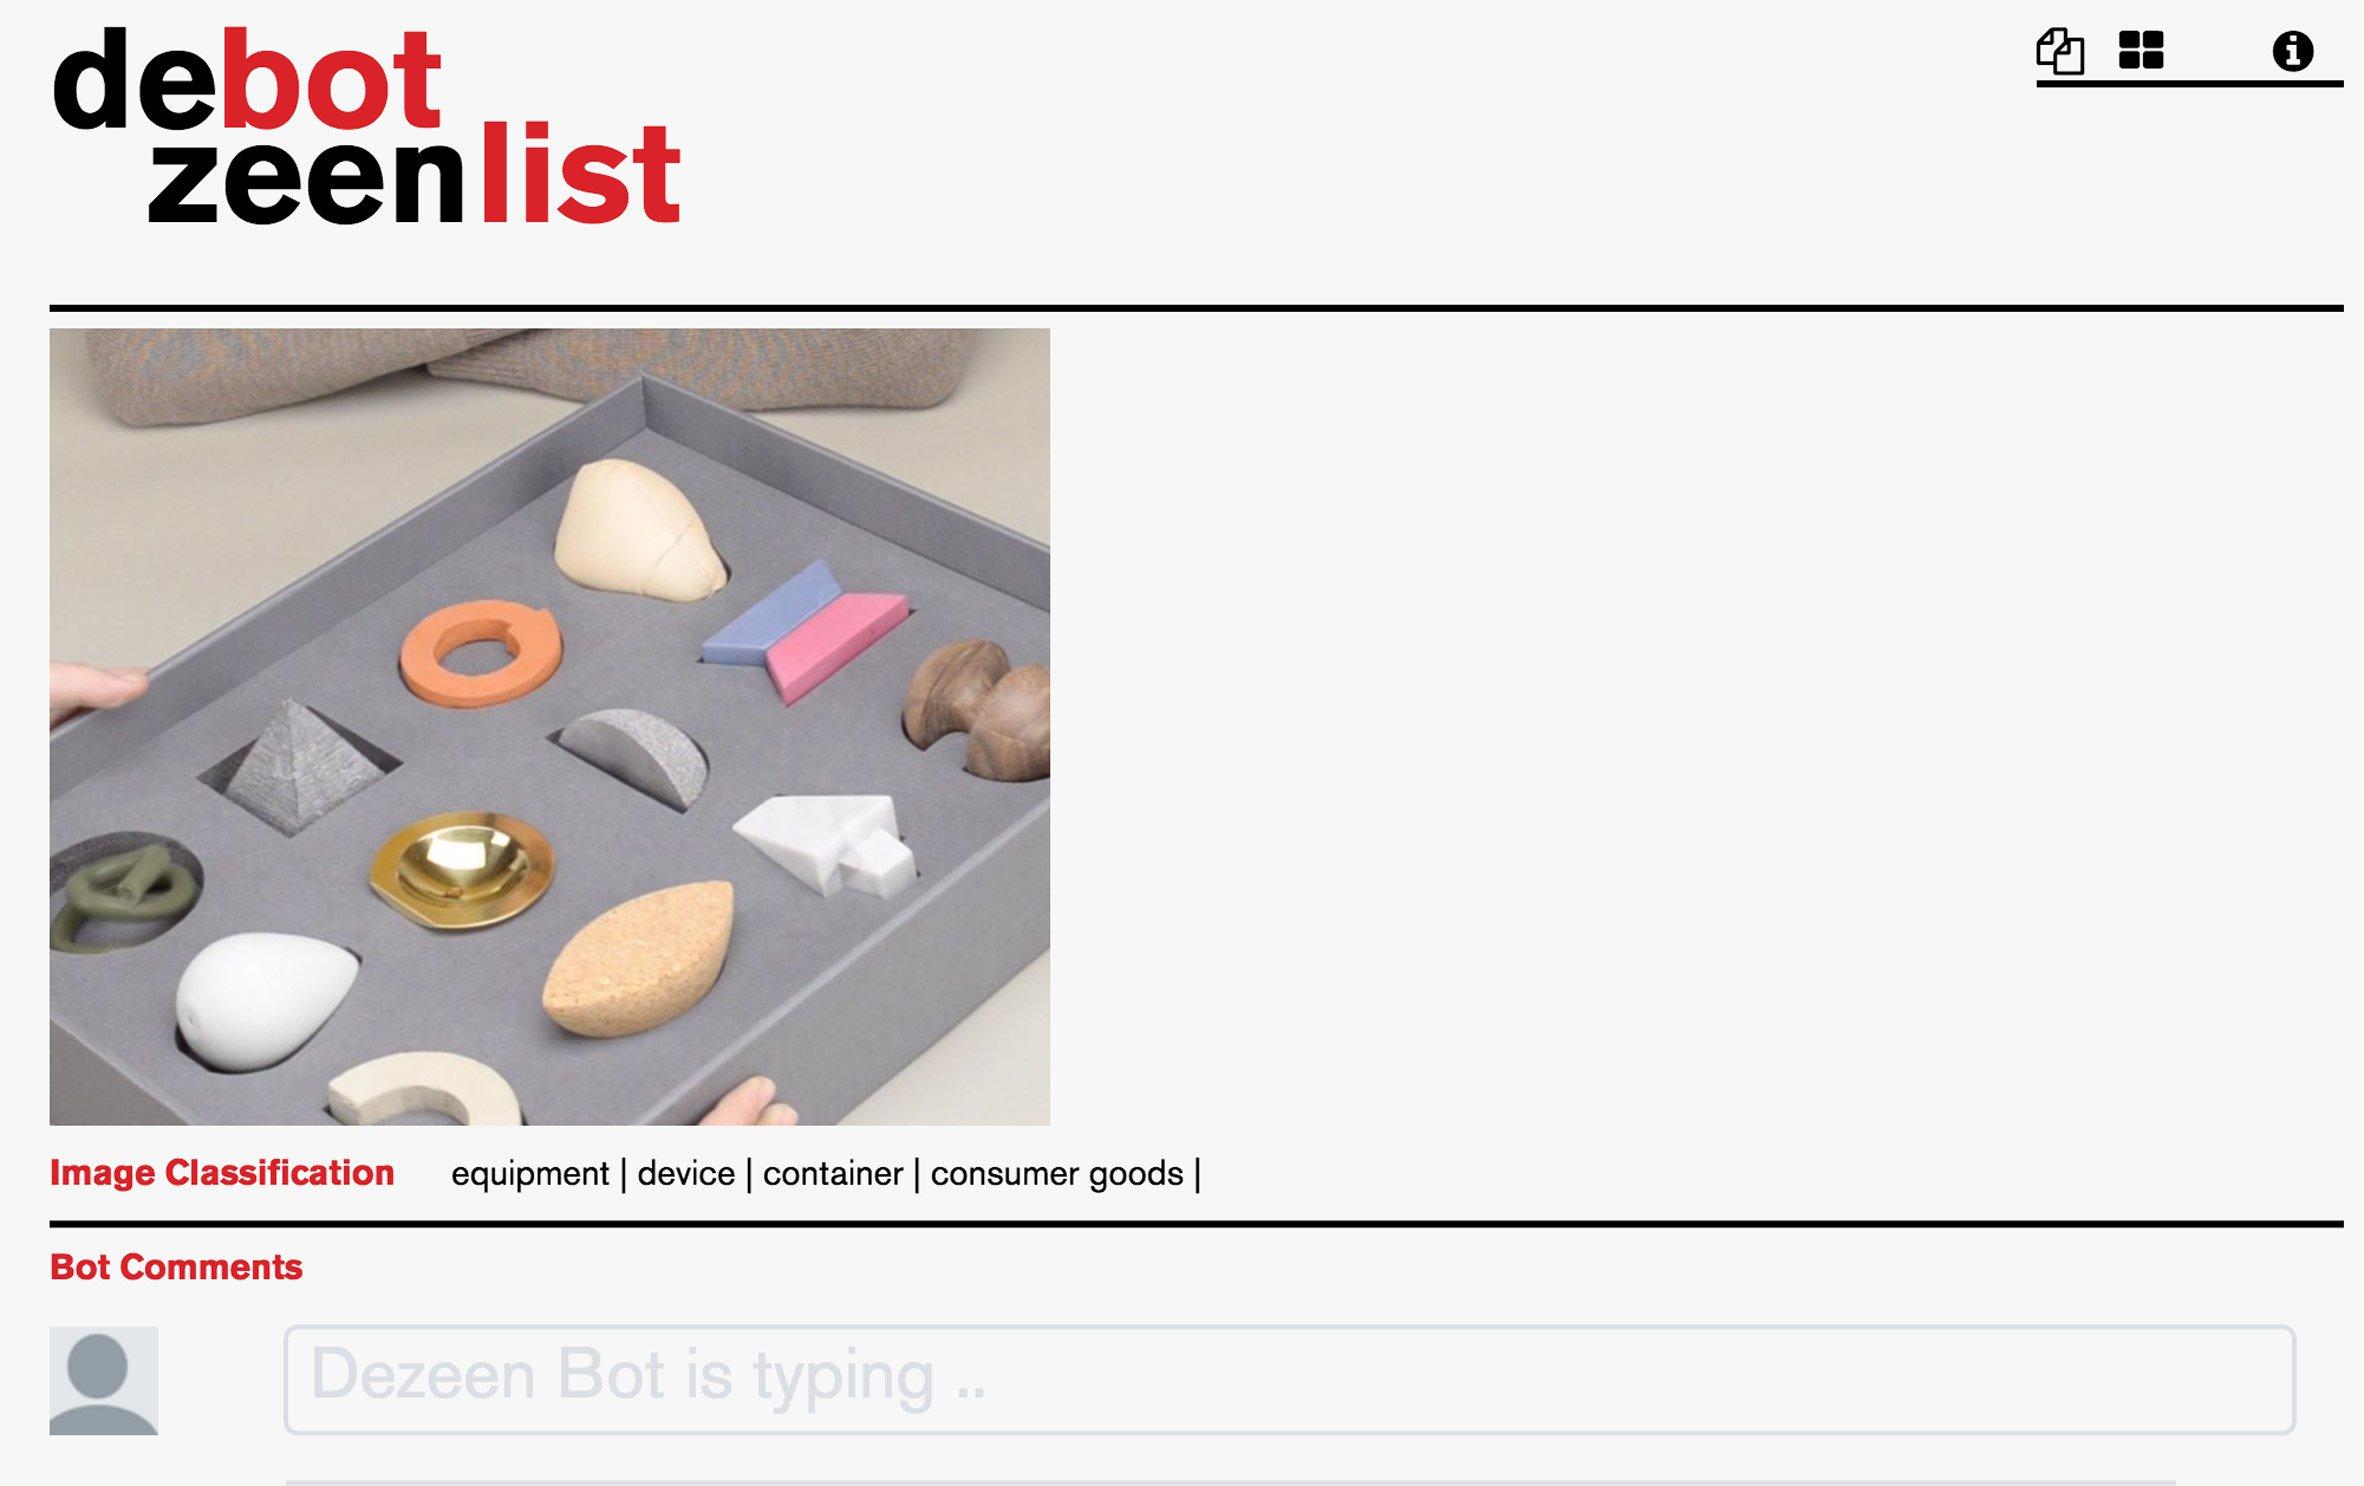 dezeen-bot-list-hot-list-design-academy-eindhoven-milan-design-week-_dezeen_2364_col_1.jpg